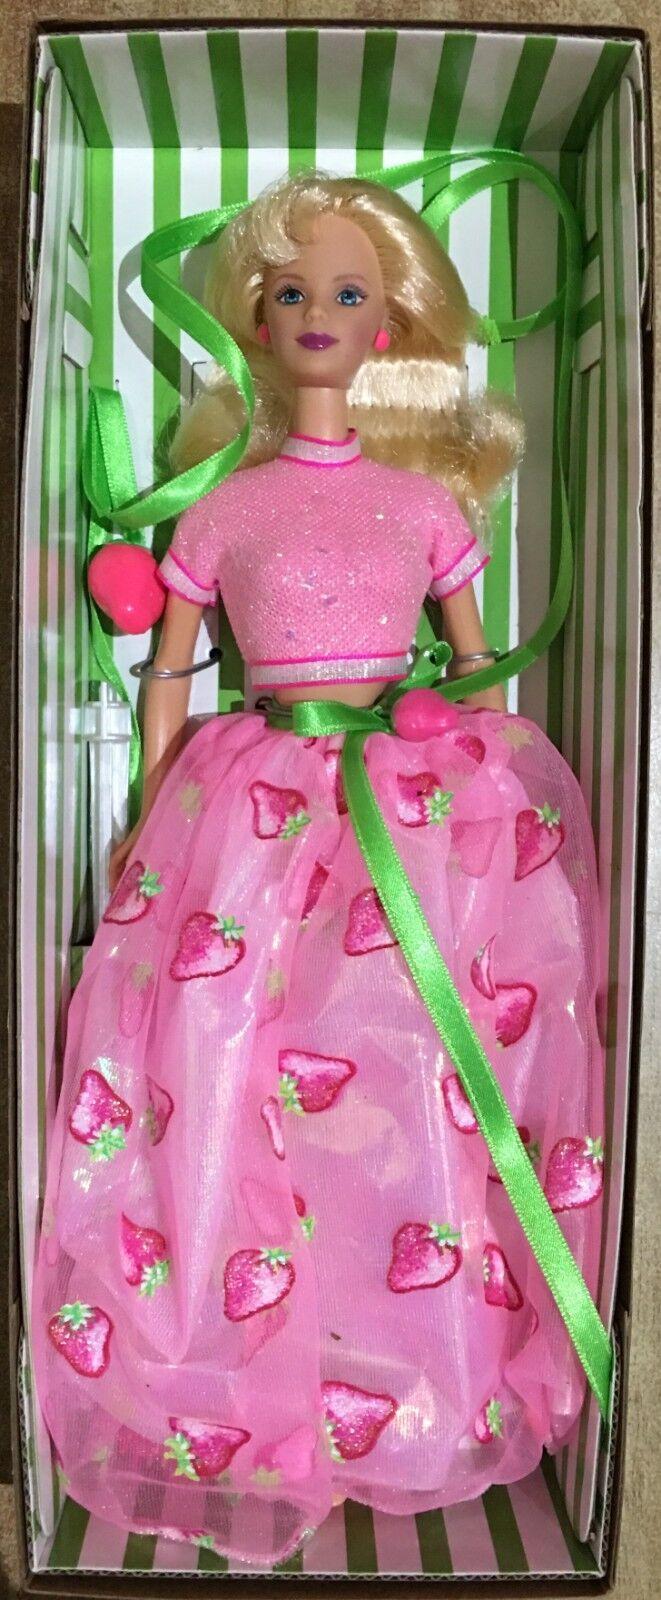 Barbie Mattel Strawberry Sorbet Avon Special Edition Edition Edition 98' 543451